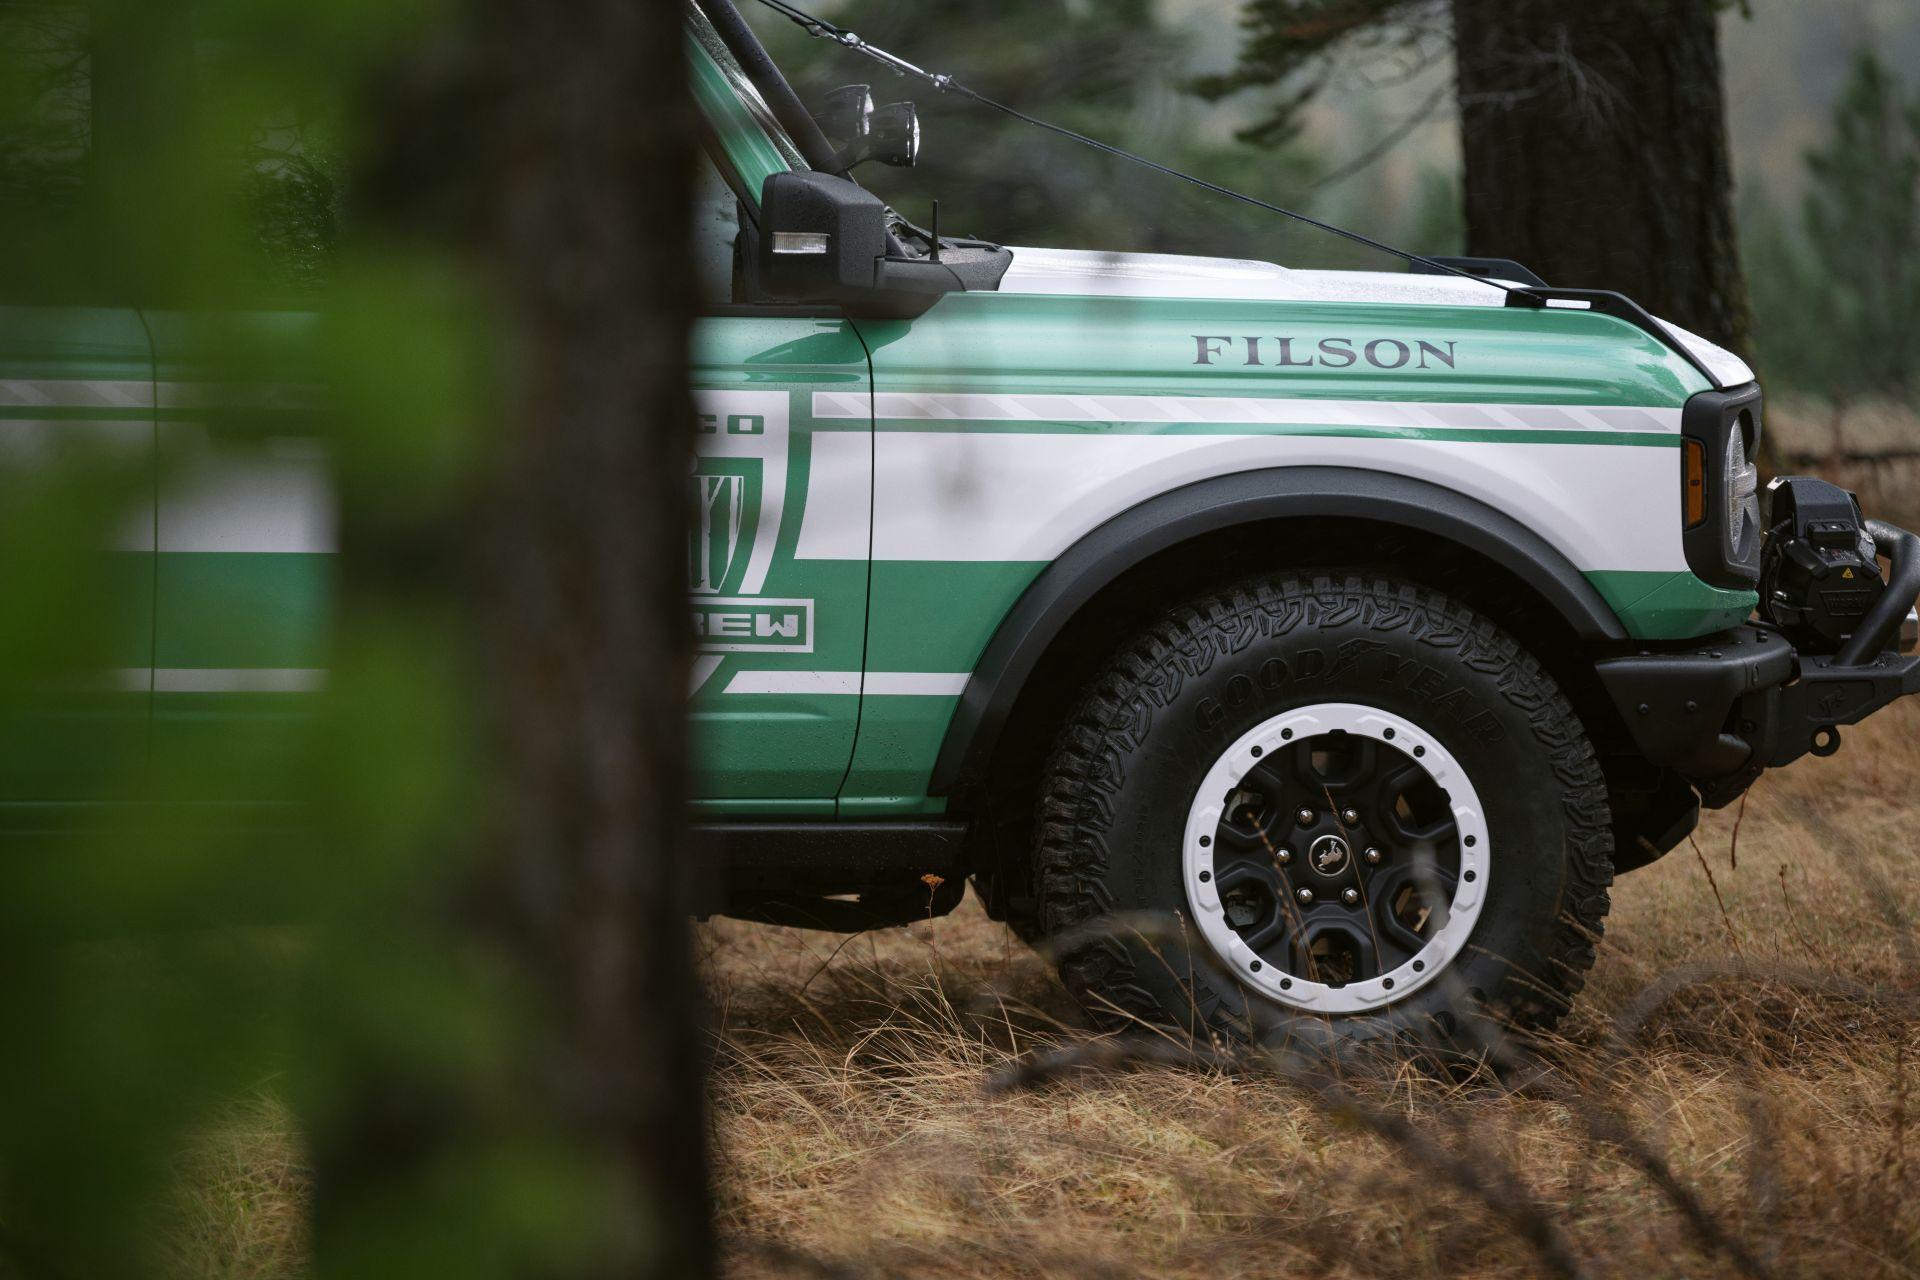 Ford-Bronco-Wildland-Fire-Rig-Concept-8